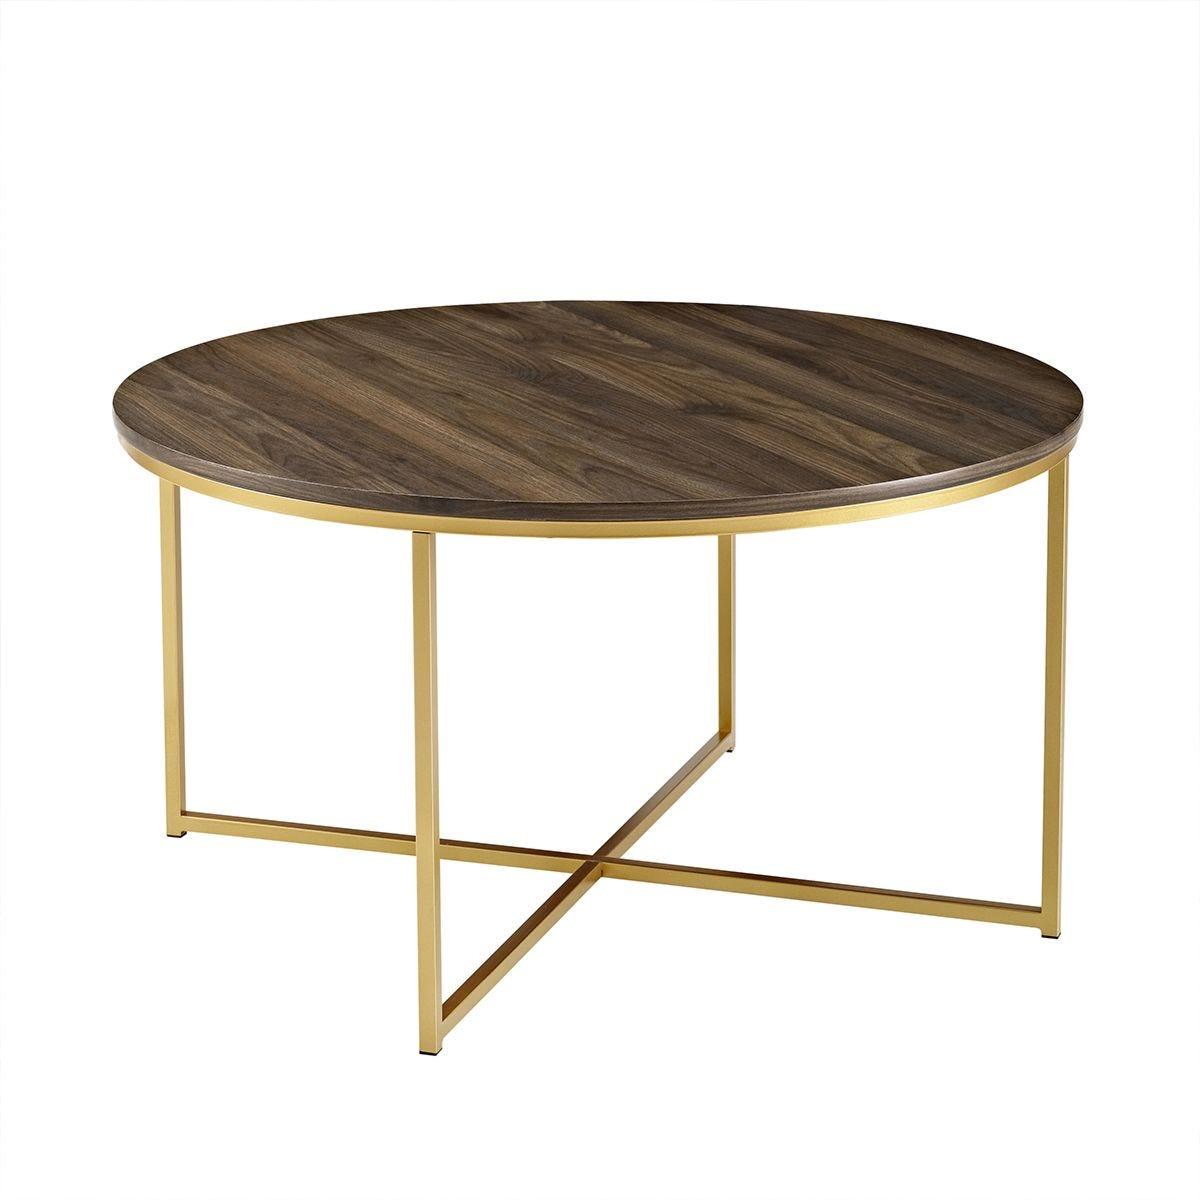 Mid Century Modern Coffee Table - Dark Walnut/Gold